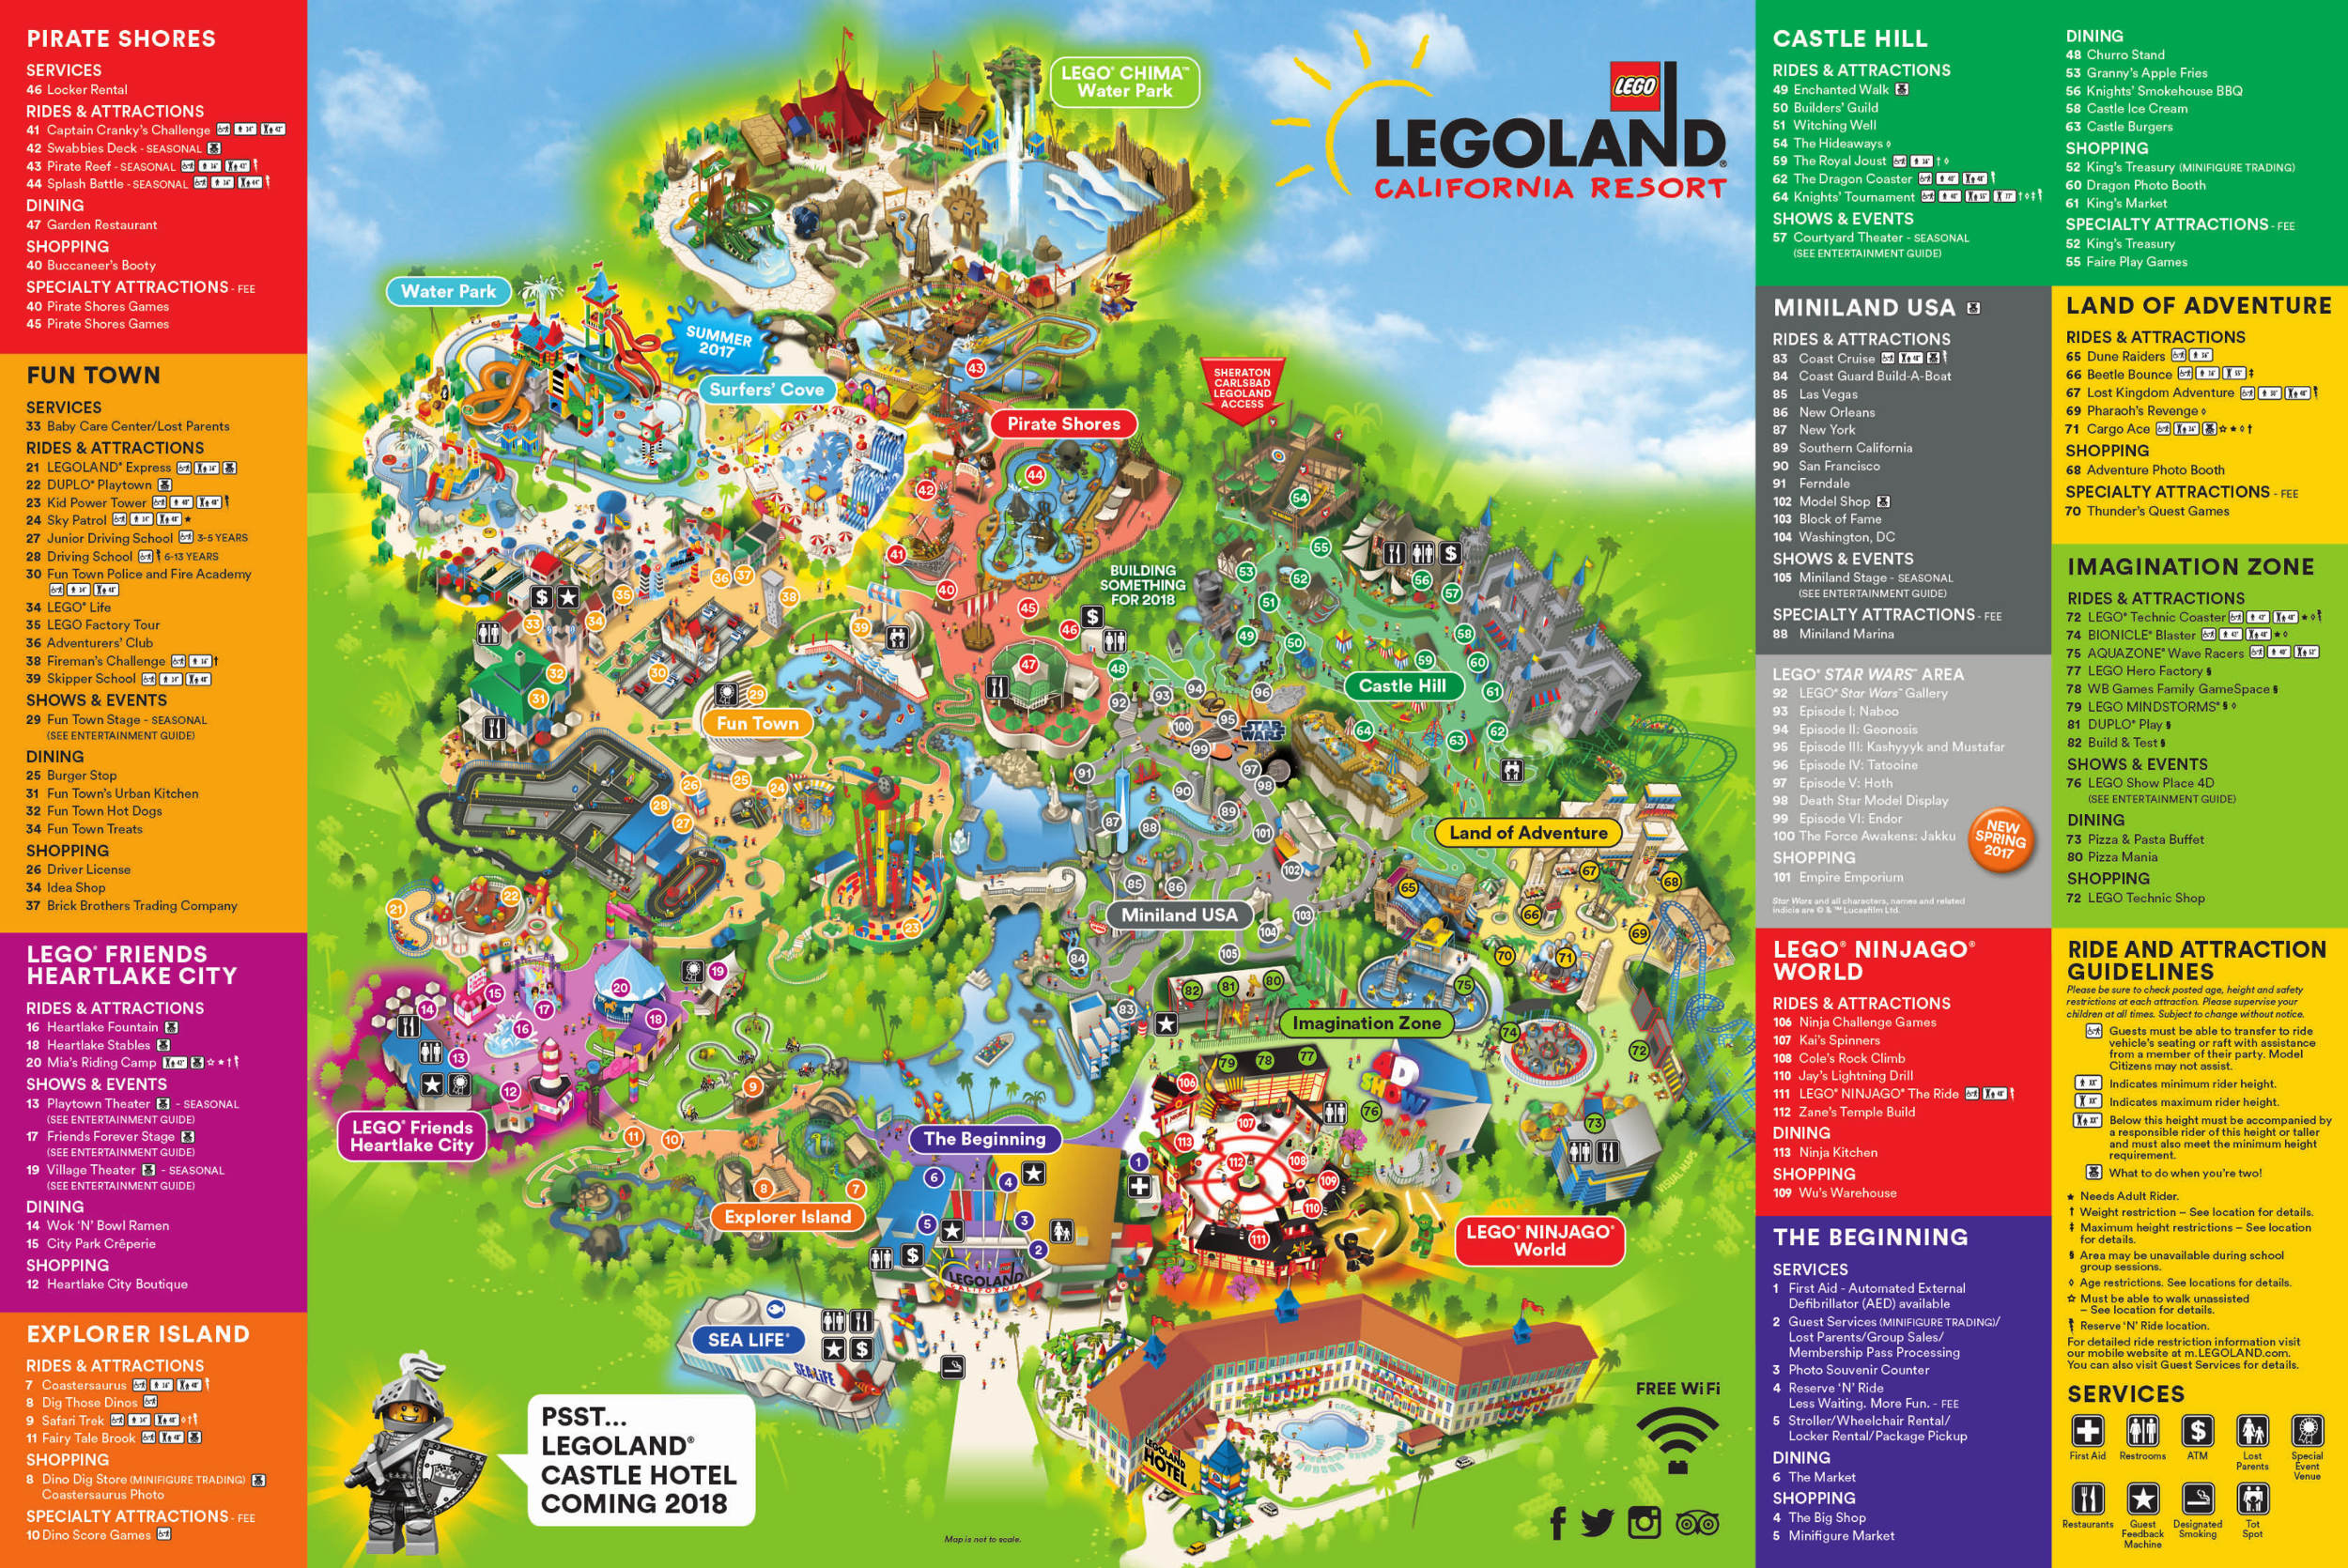 Legoland California Resort Theme Park Map Maps Of California - Legoland Map California 2018